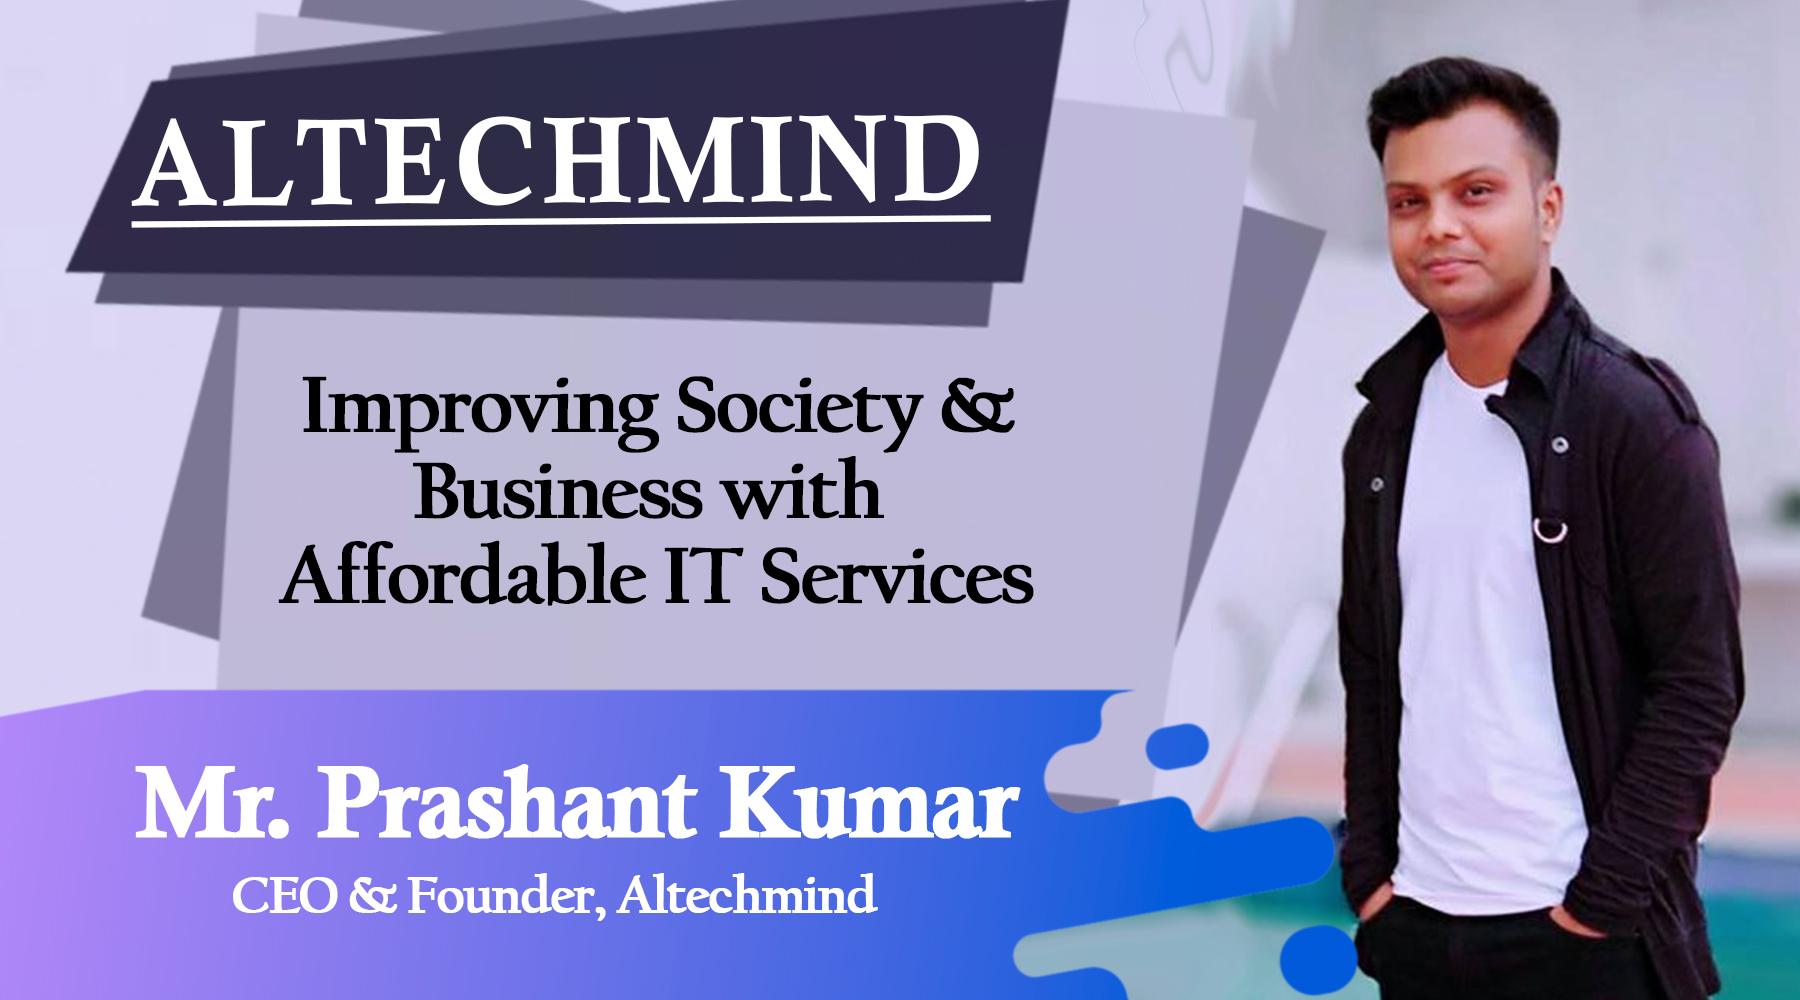 Altechmind Web Services: IT company Web Hosting, Web Design, Digital Marketing & more